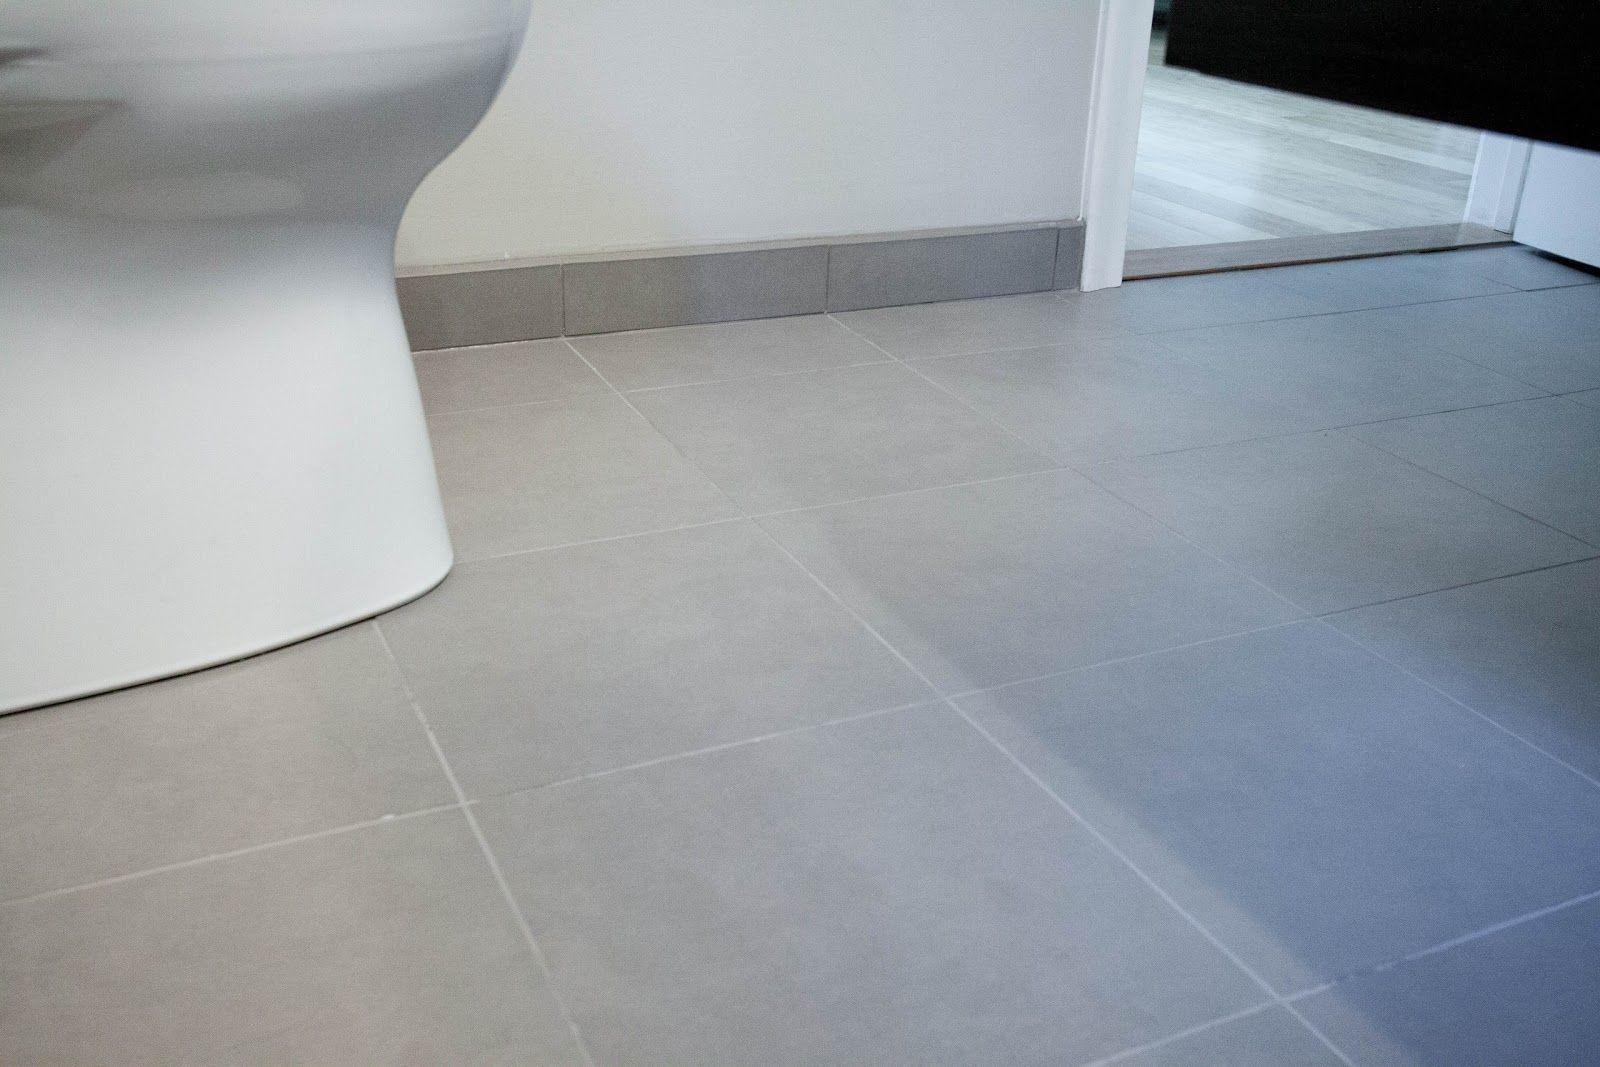 12 unique bathroom tile baseboard ideas ij09fv4  tile